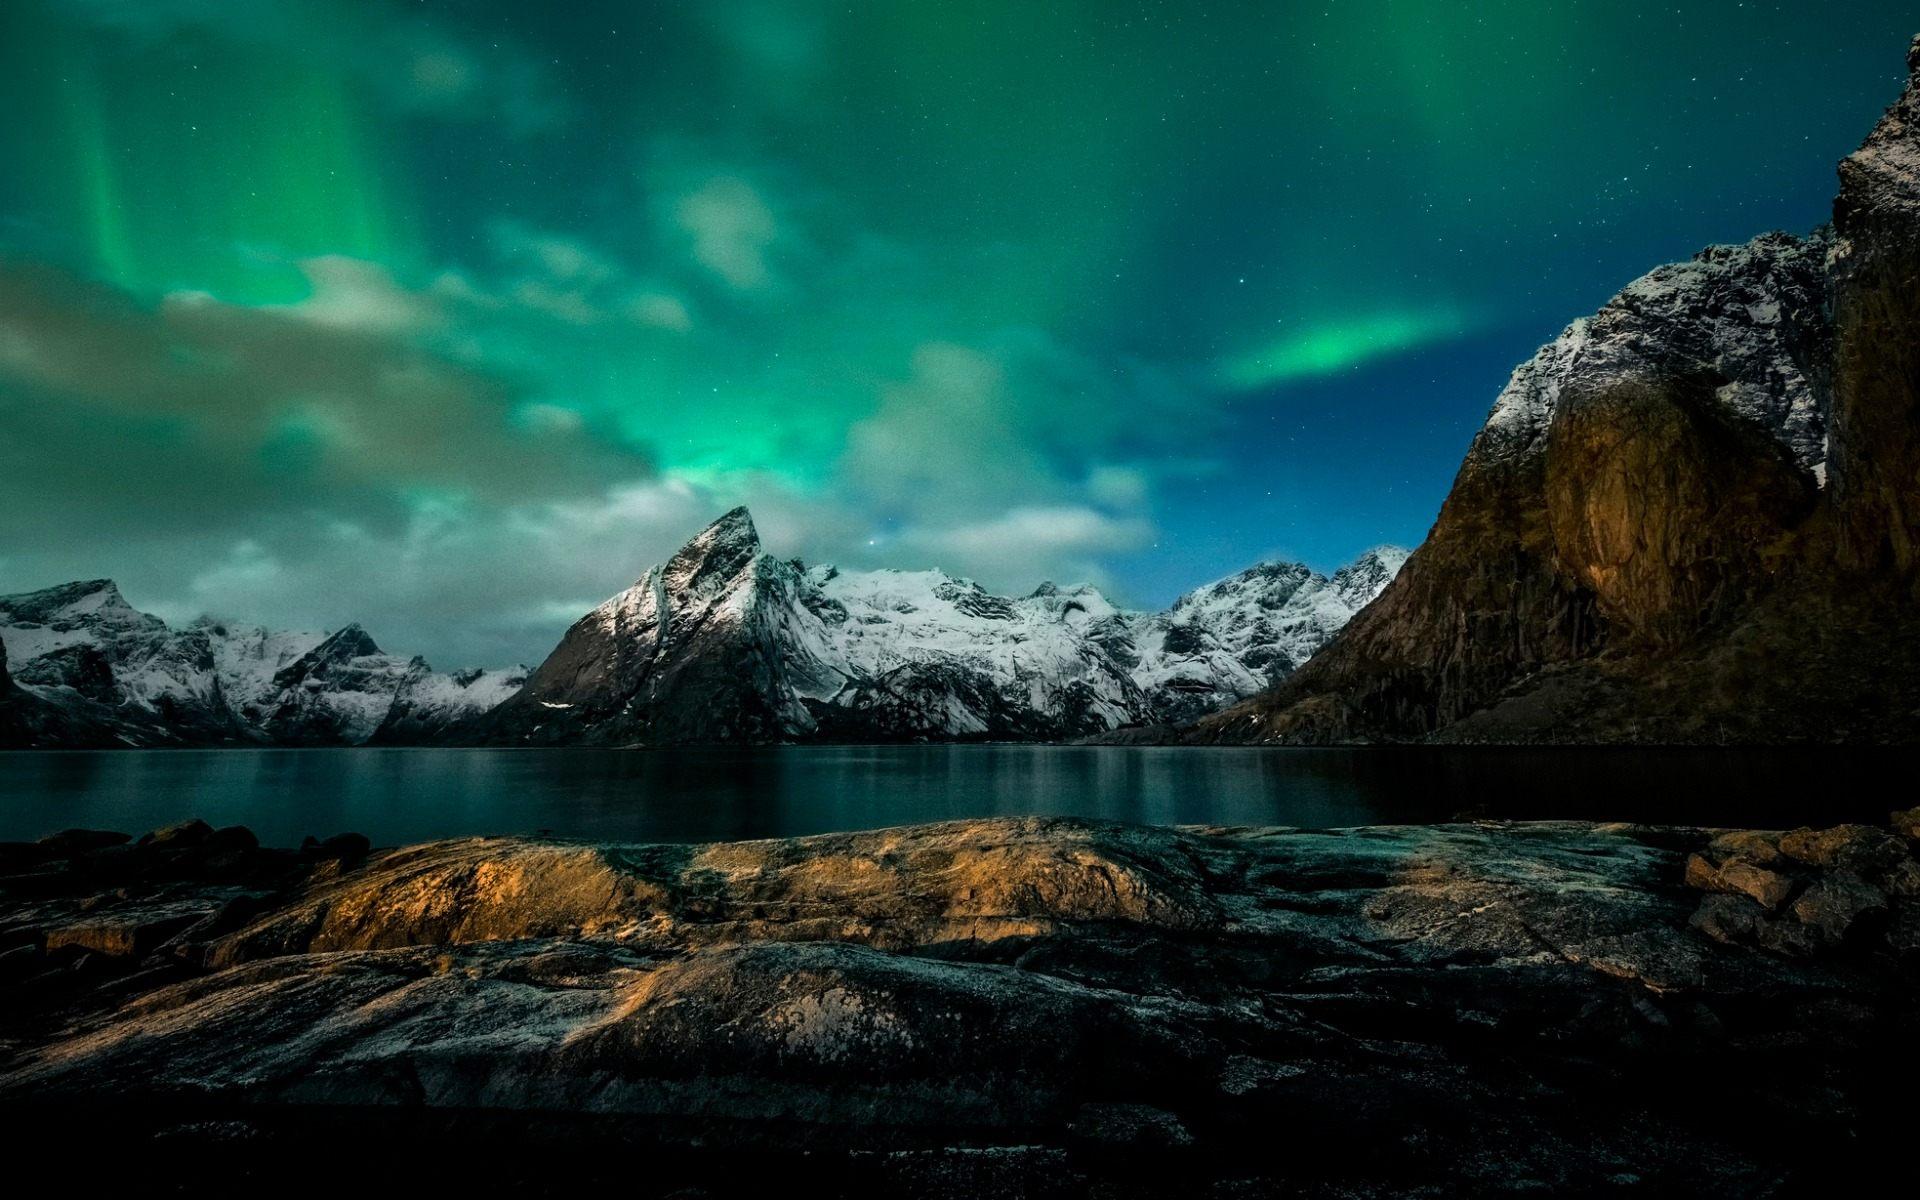 Full Hd P Northern Lights Wallpapers Hd Desktop Backgrounds 1920x1200